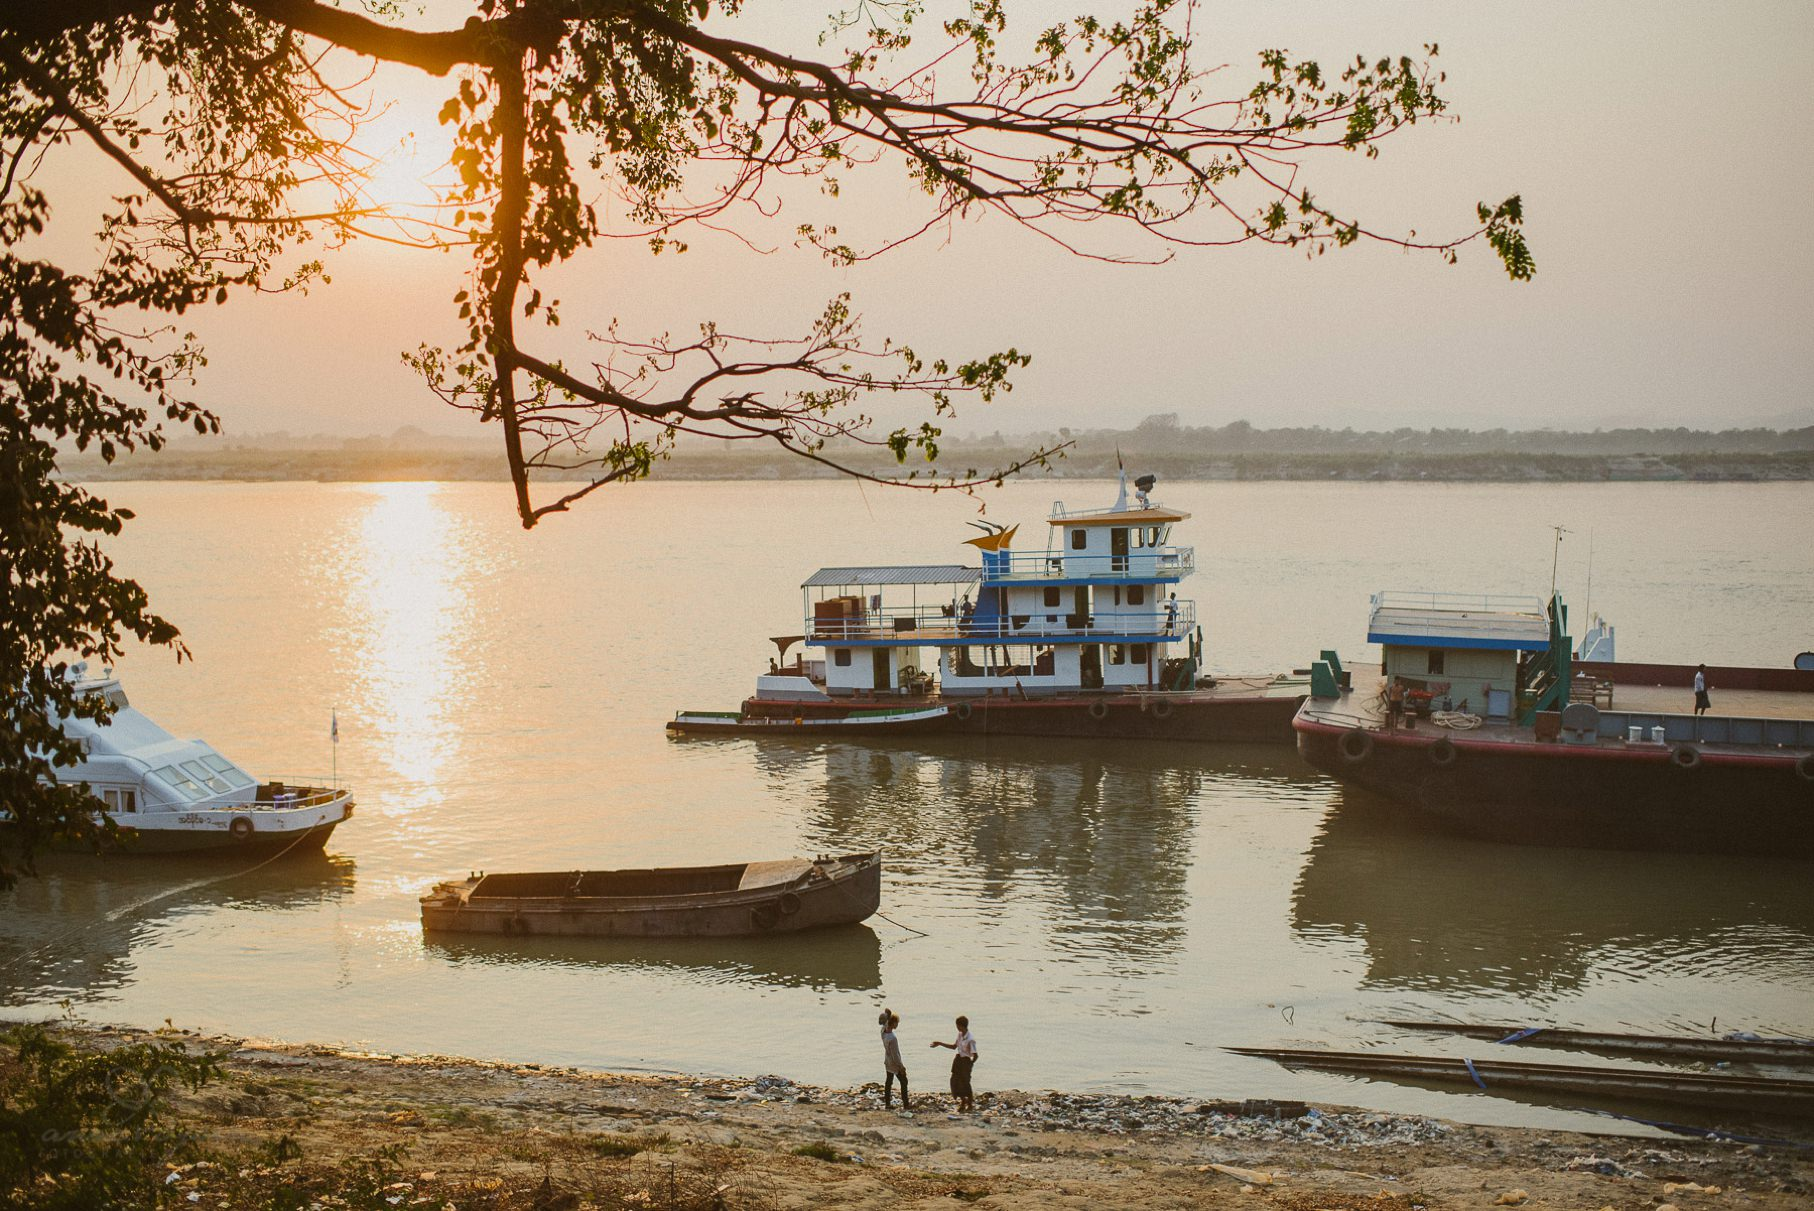 0065 yangon mandalay d76 7067 - Großstädte Myanmars - Yangon & Mandalay